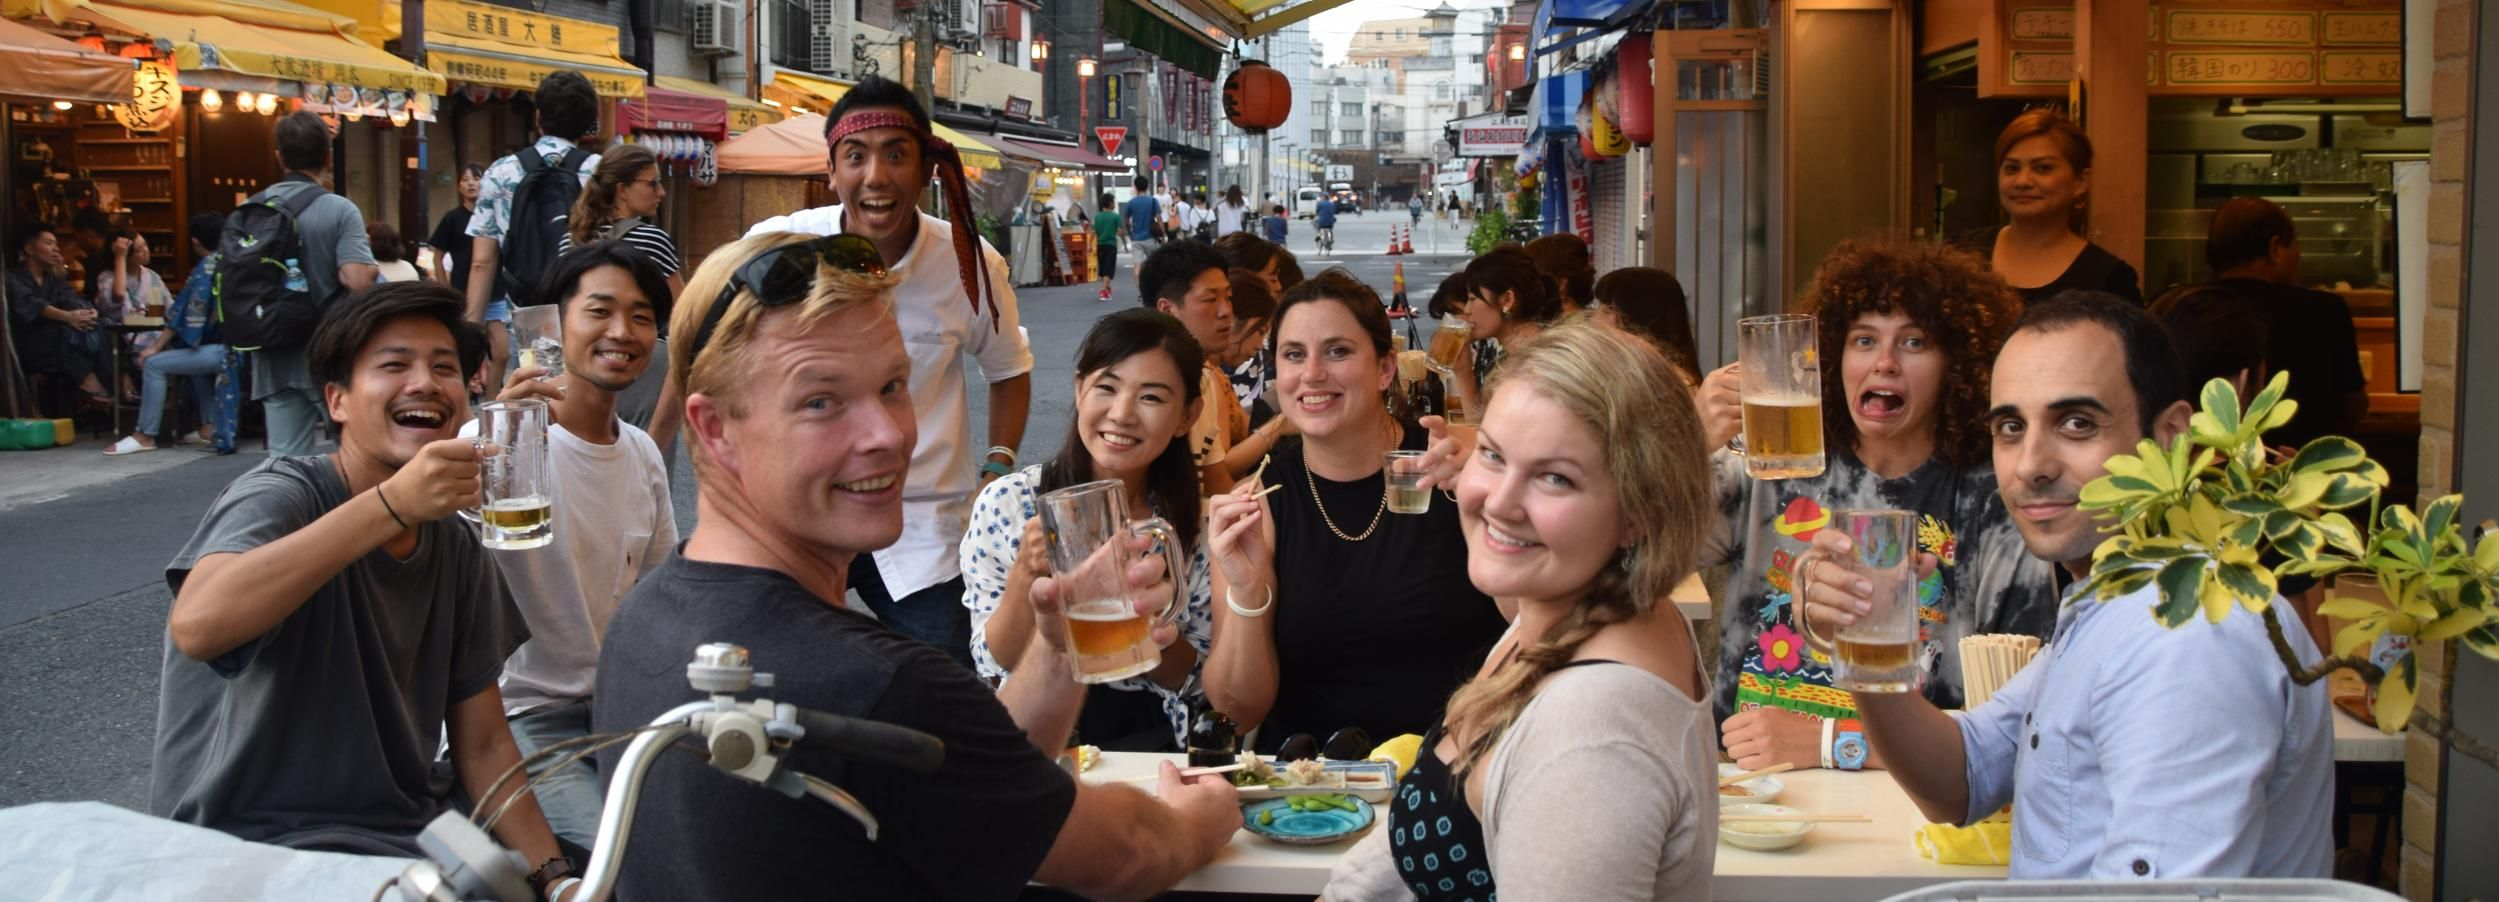 Tokio: Lokale Food & Drink-Tour bei Nacht in Asakusa